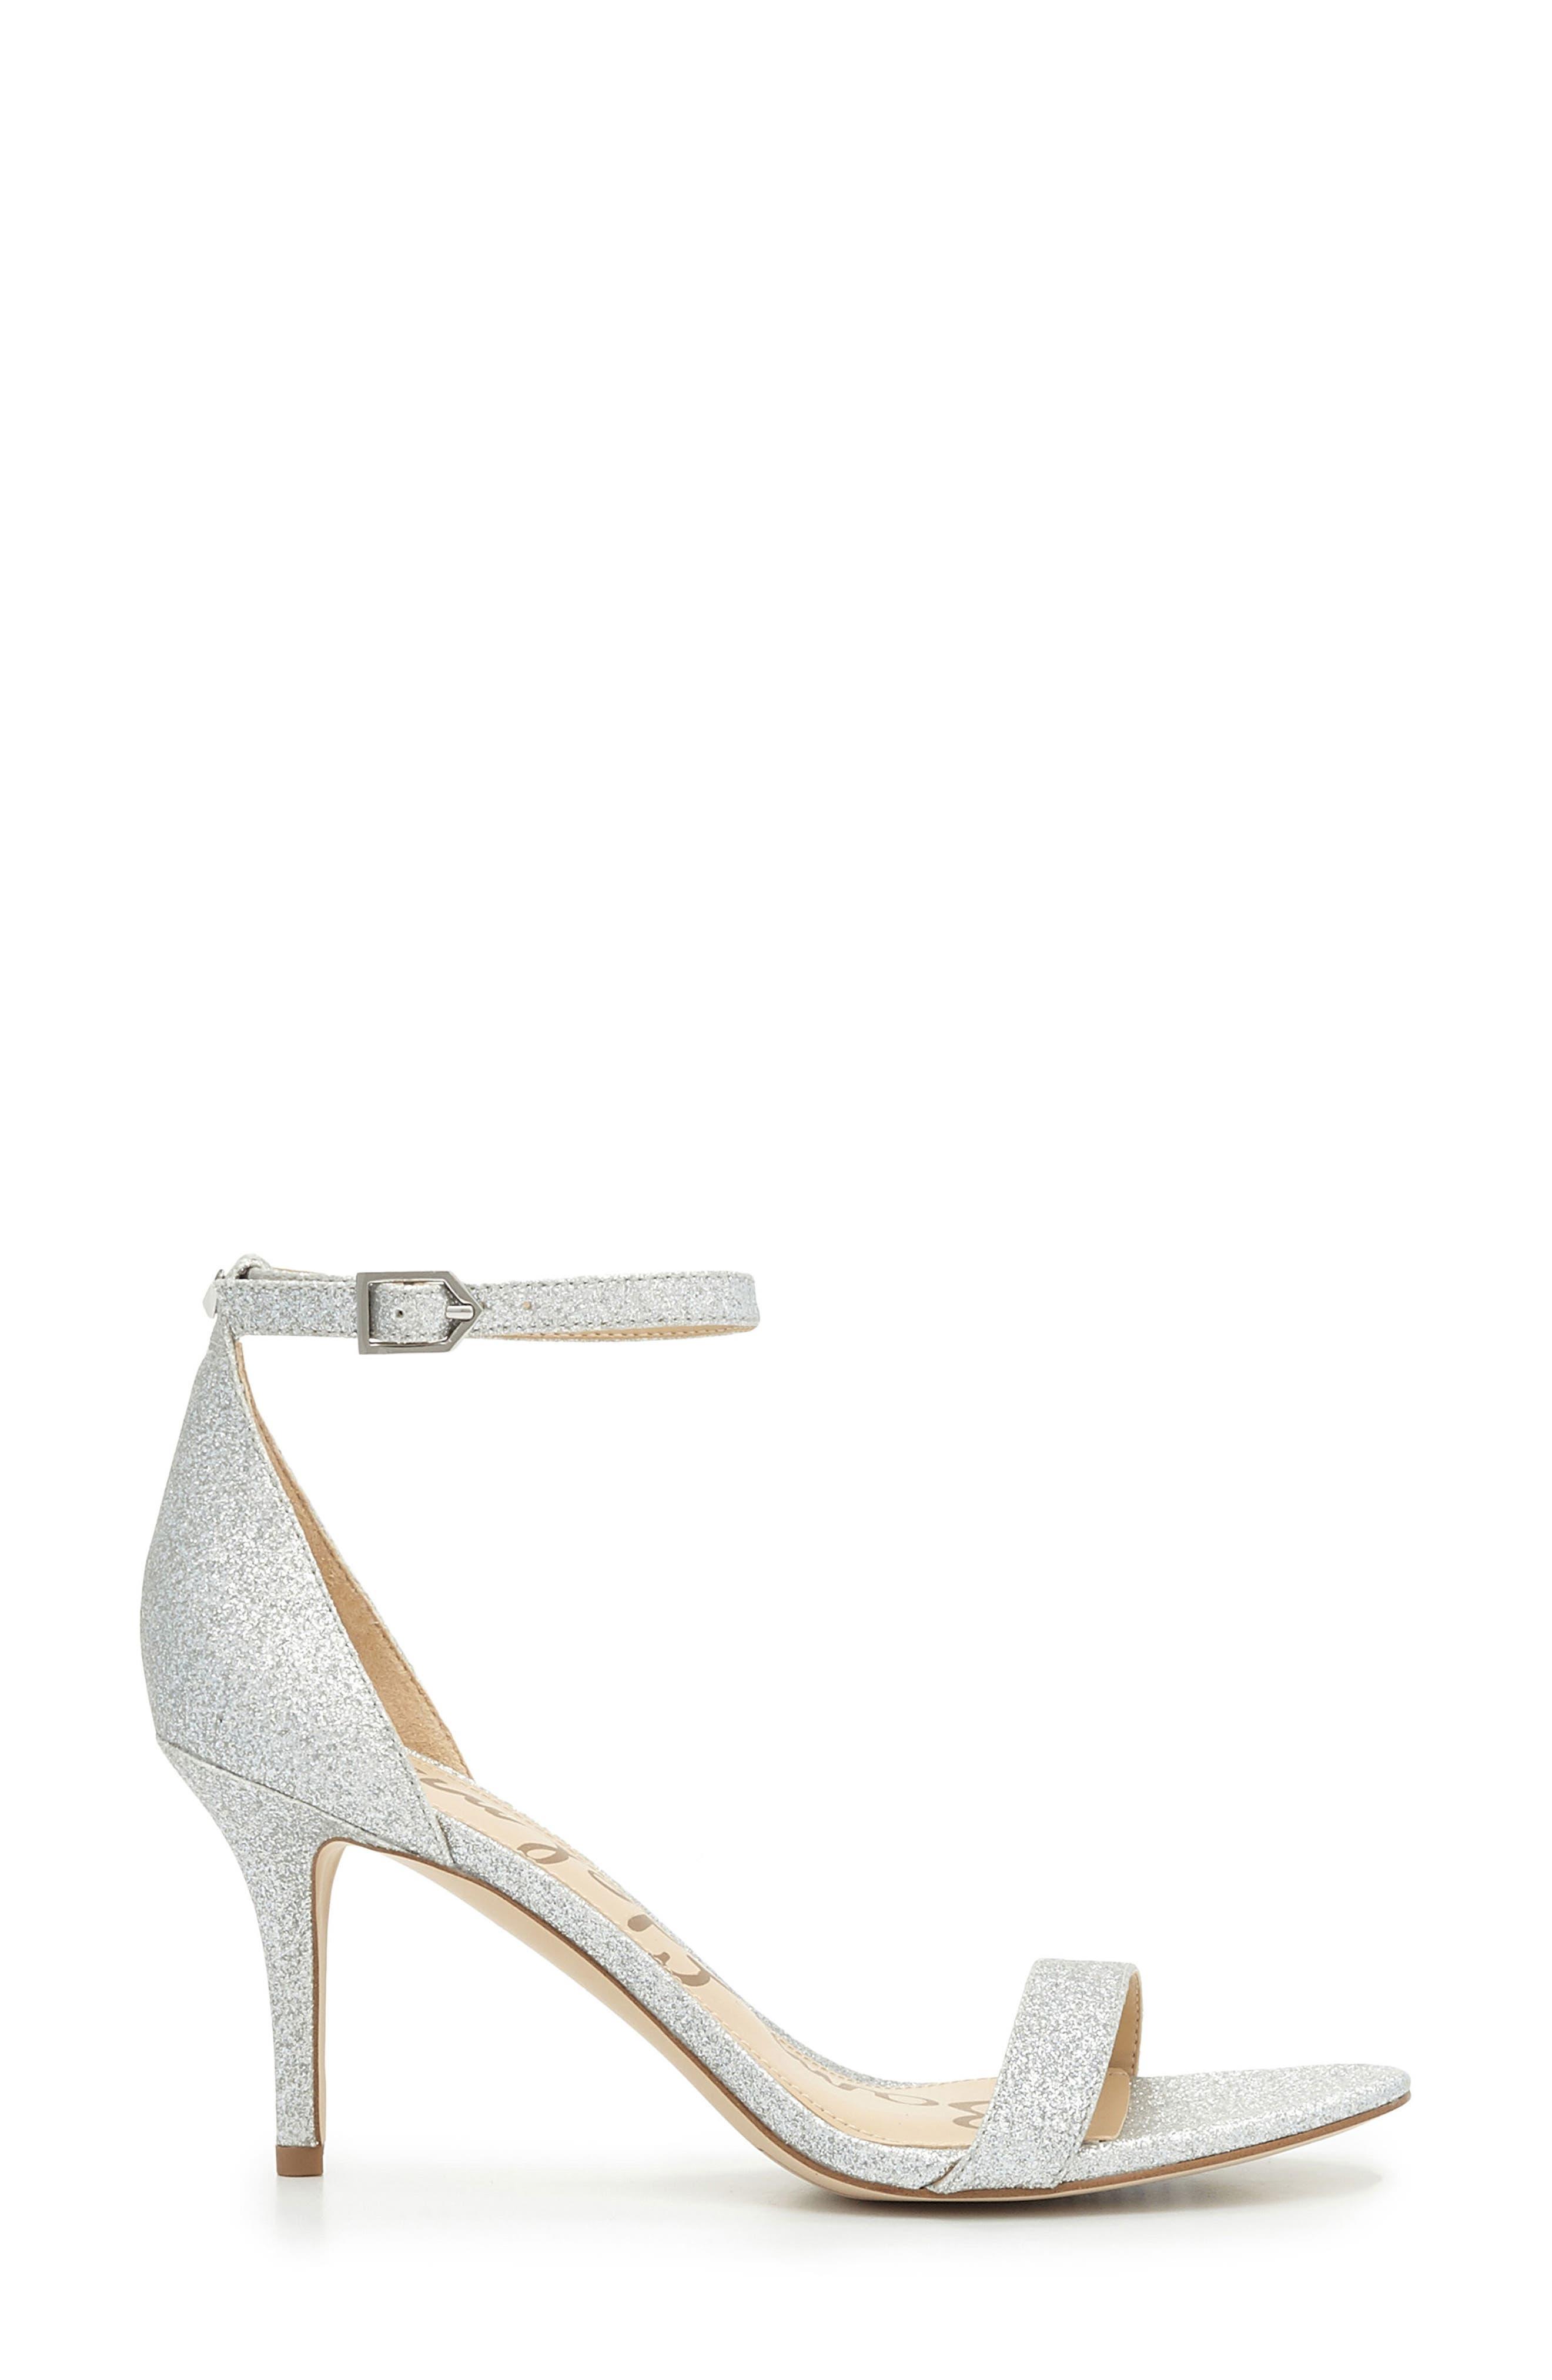 ,                             'Patti' Ankle Strap Sandal,                             Alternate thumbnail 47, color,                             045